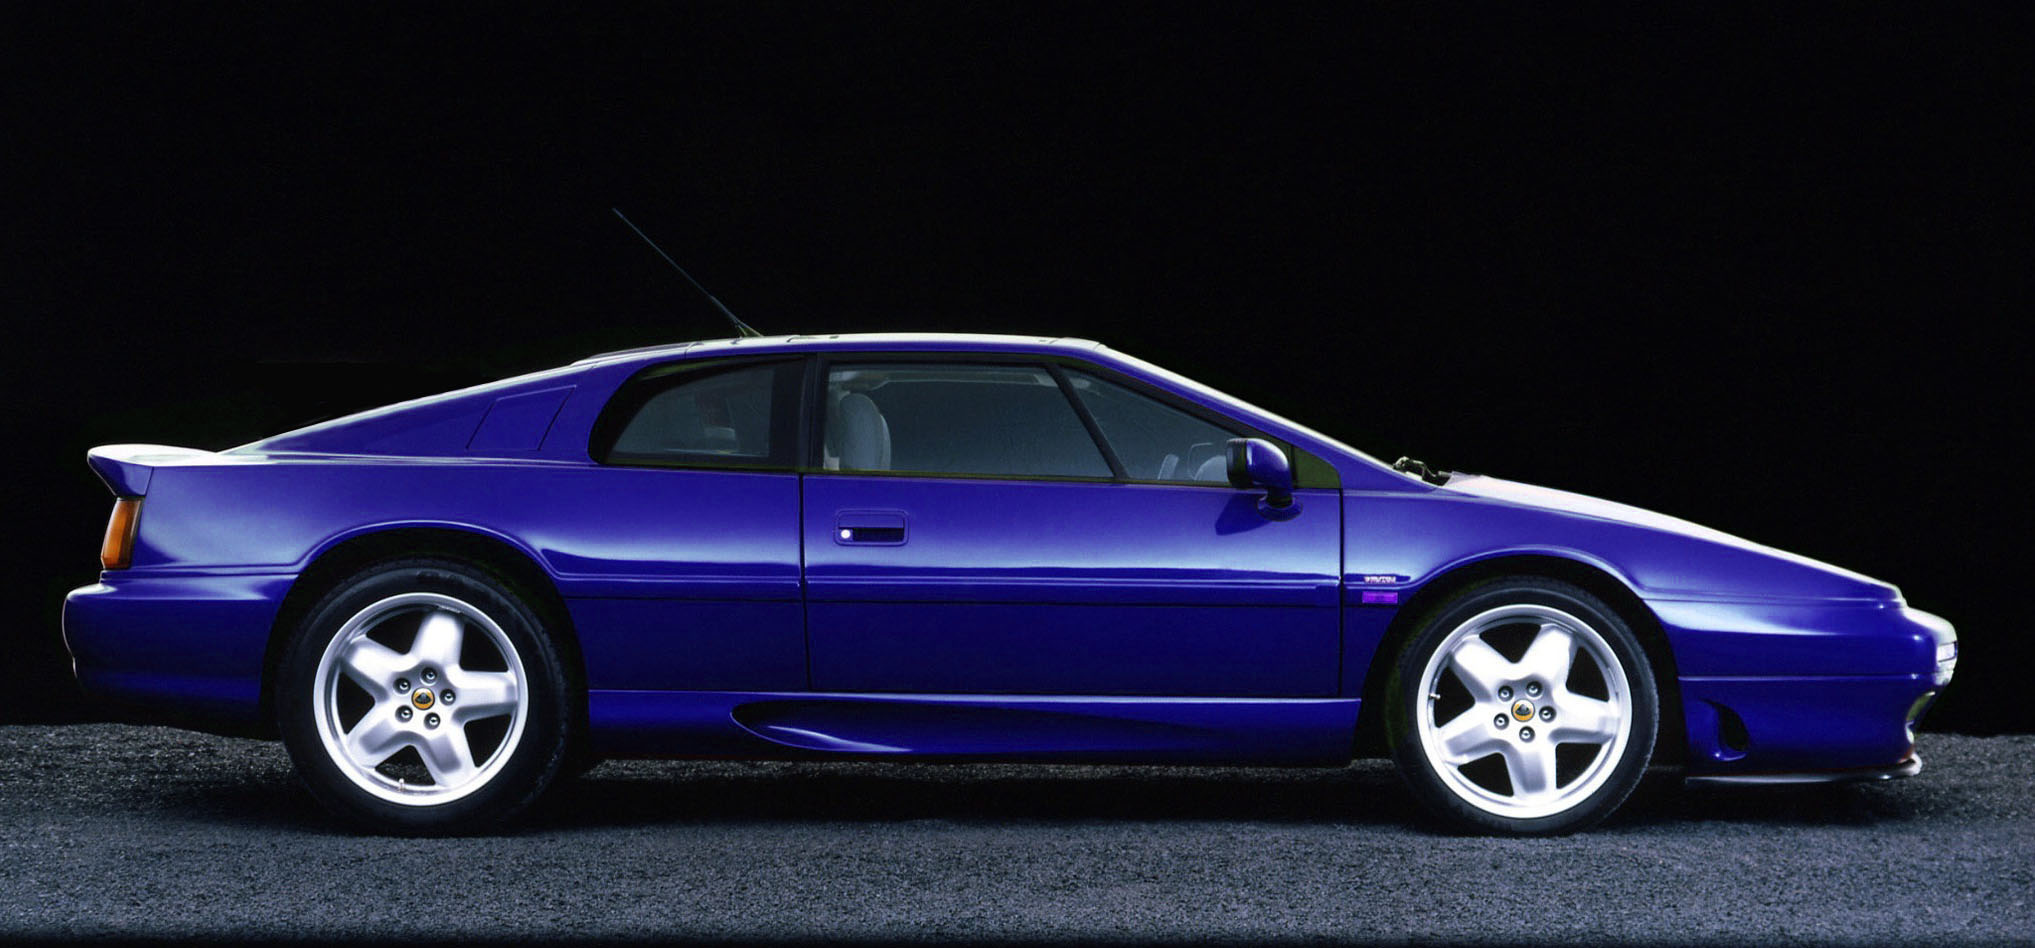 Lotus Esprit V8 GT